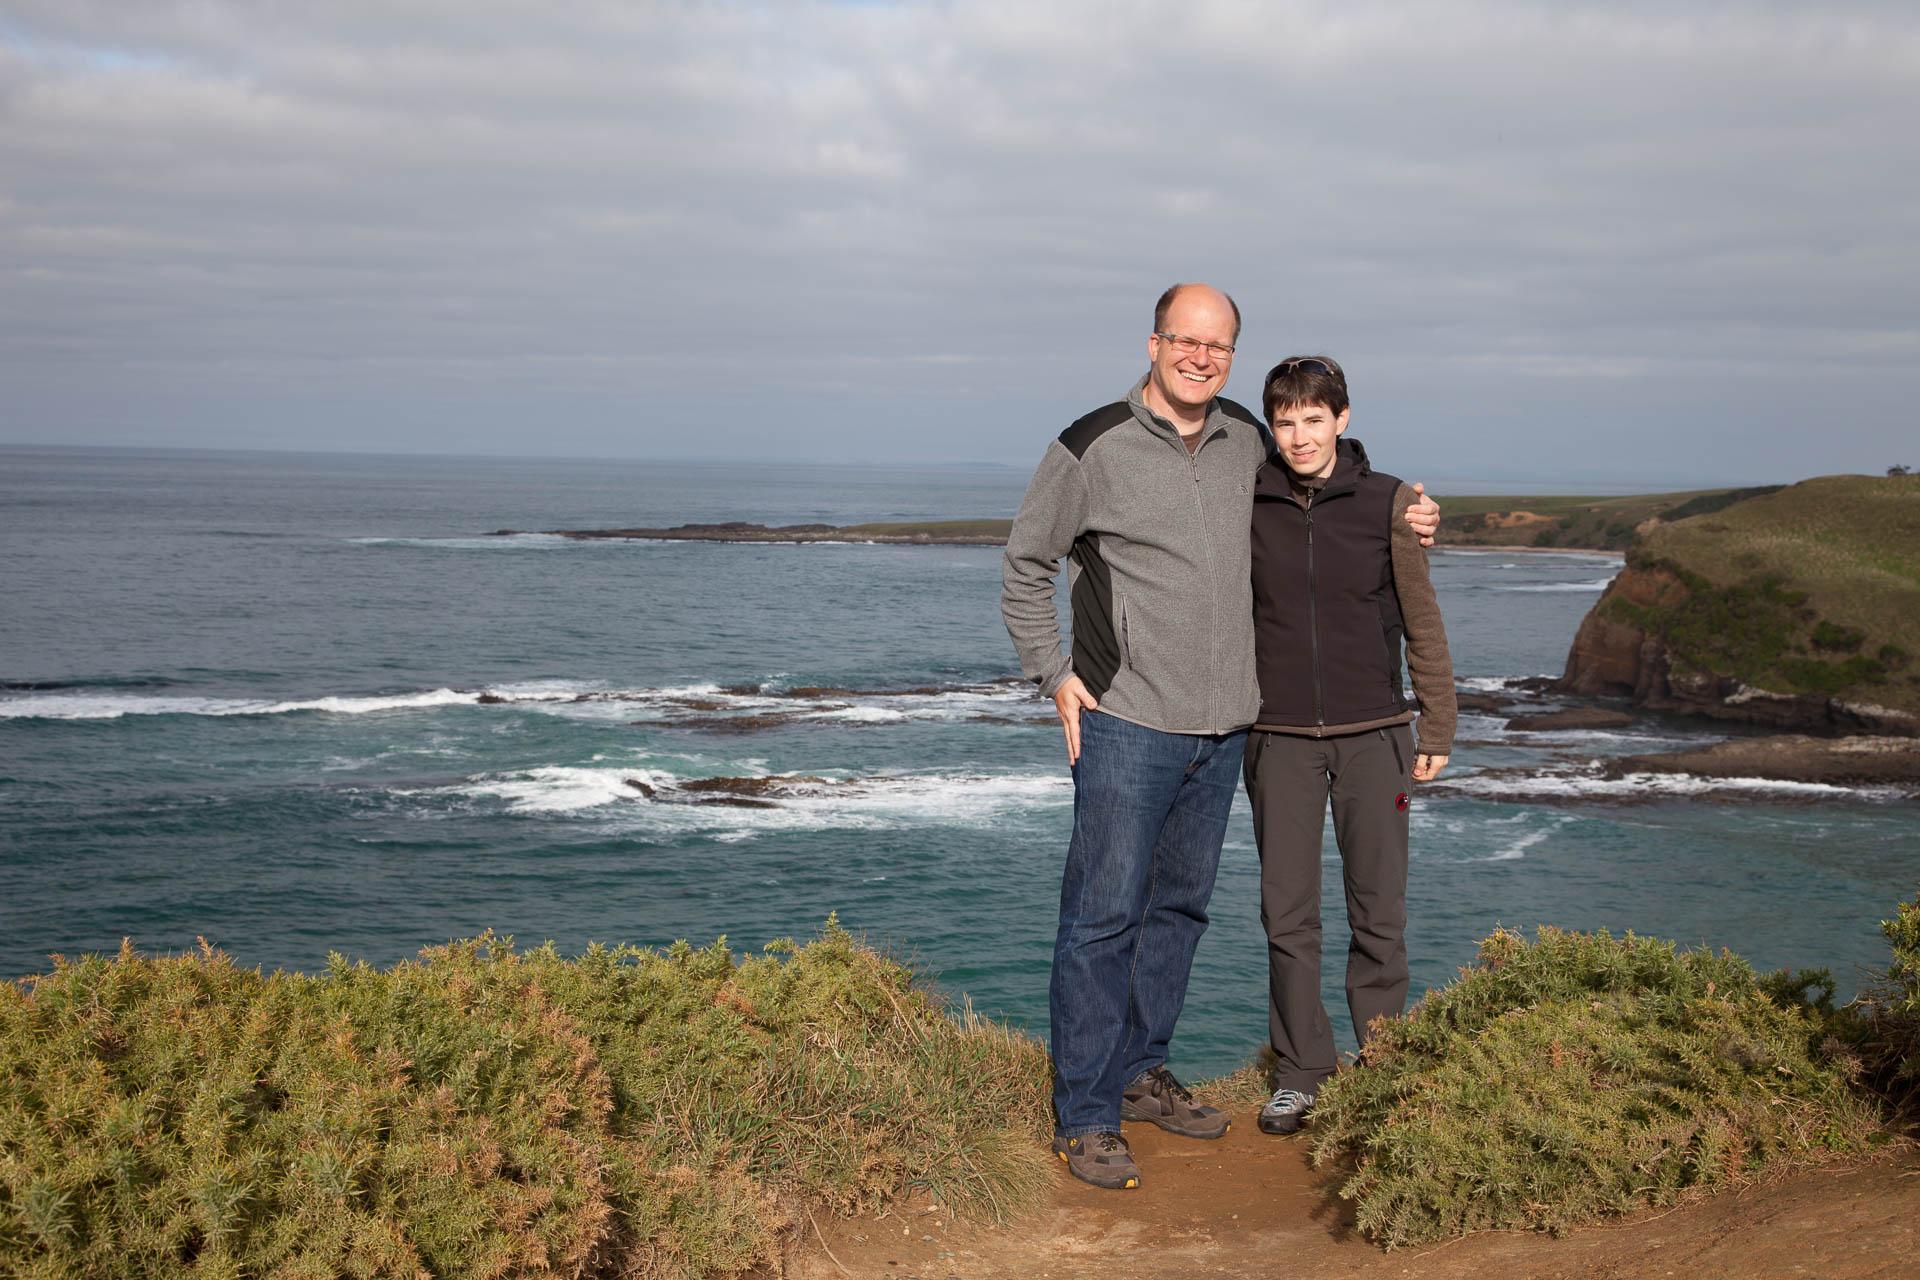 Slope Point Cliffs